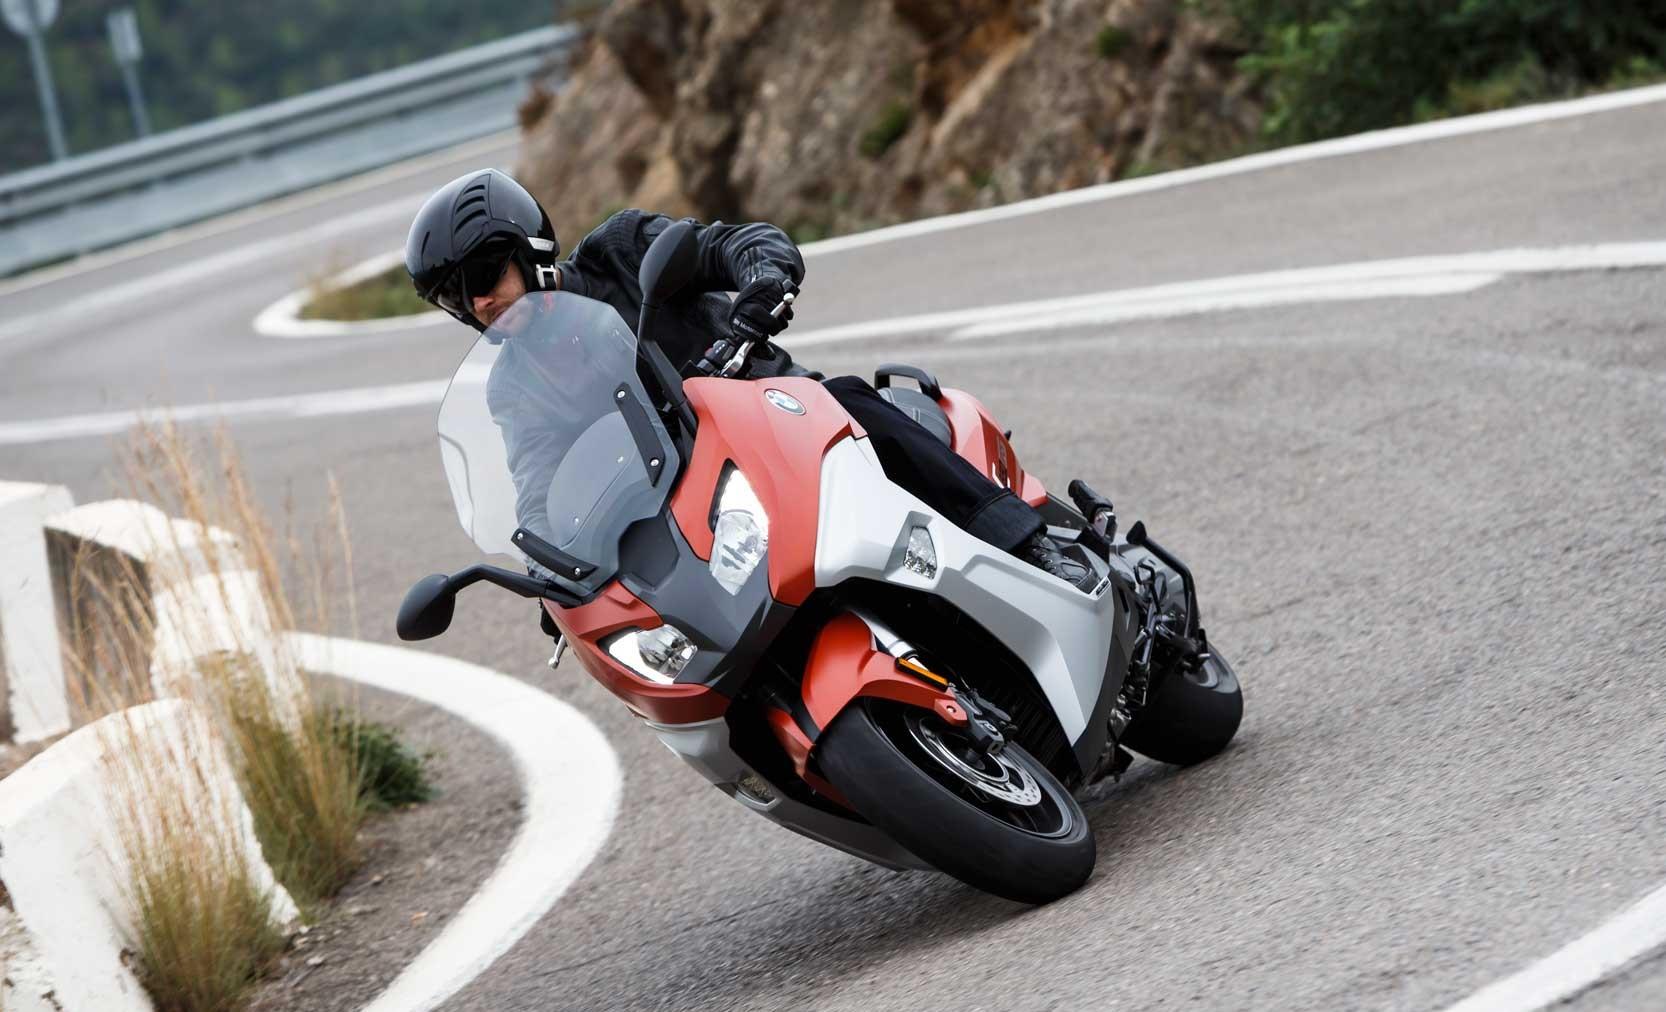 moteur-bmw-c-650-sport-bicylindre-647-cc-transmission-cvt